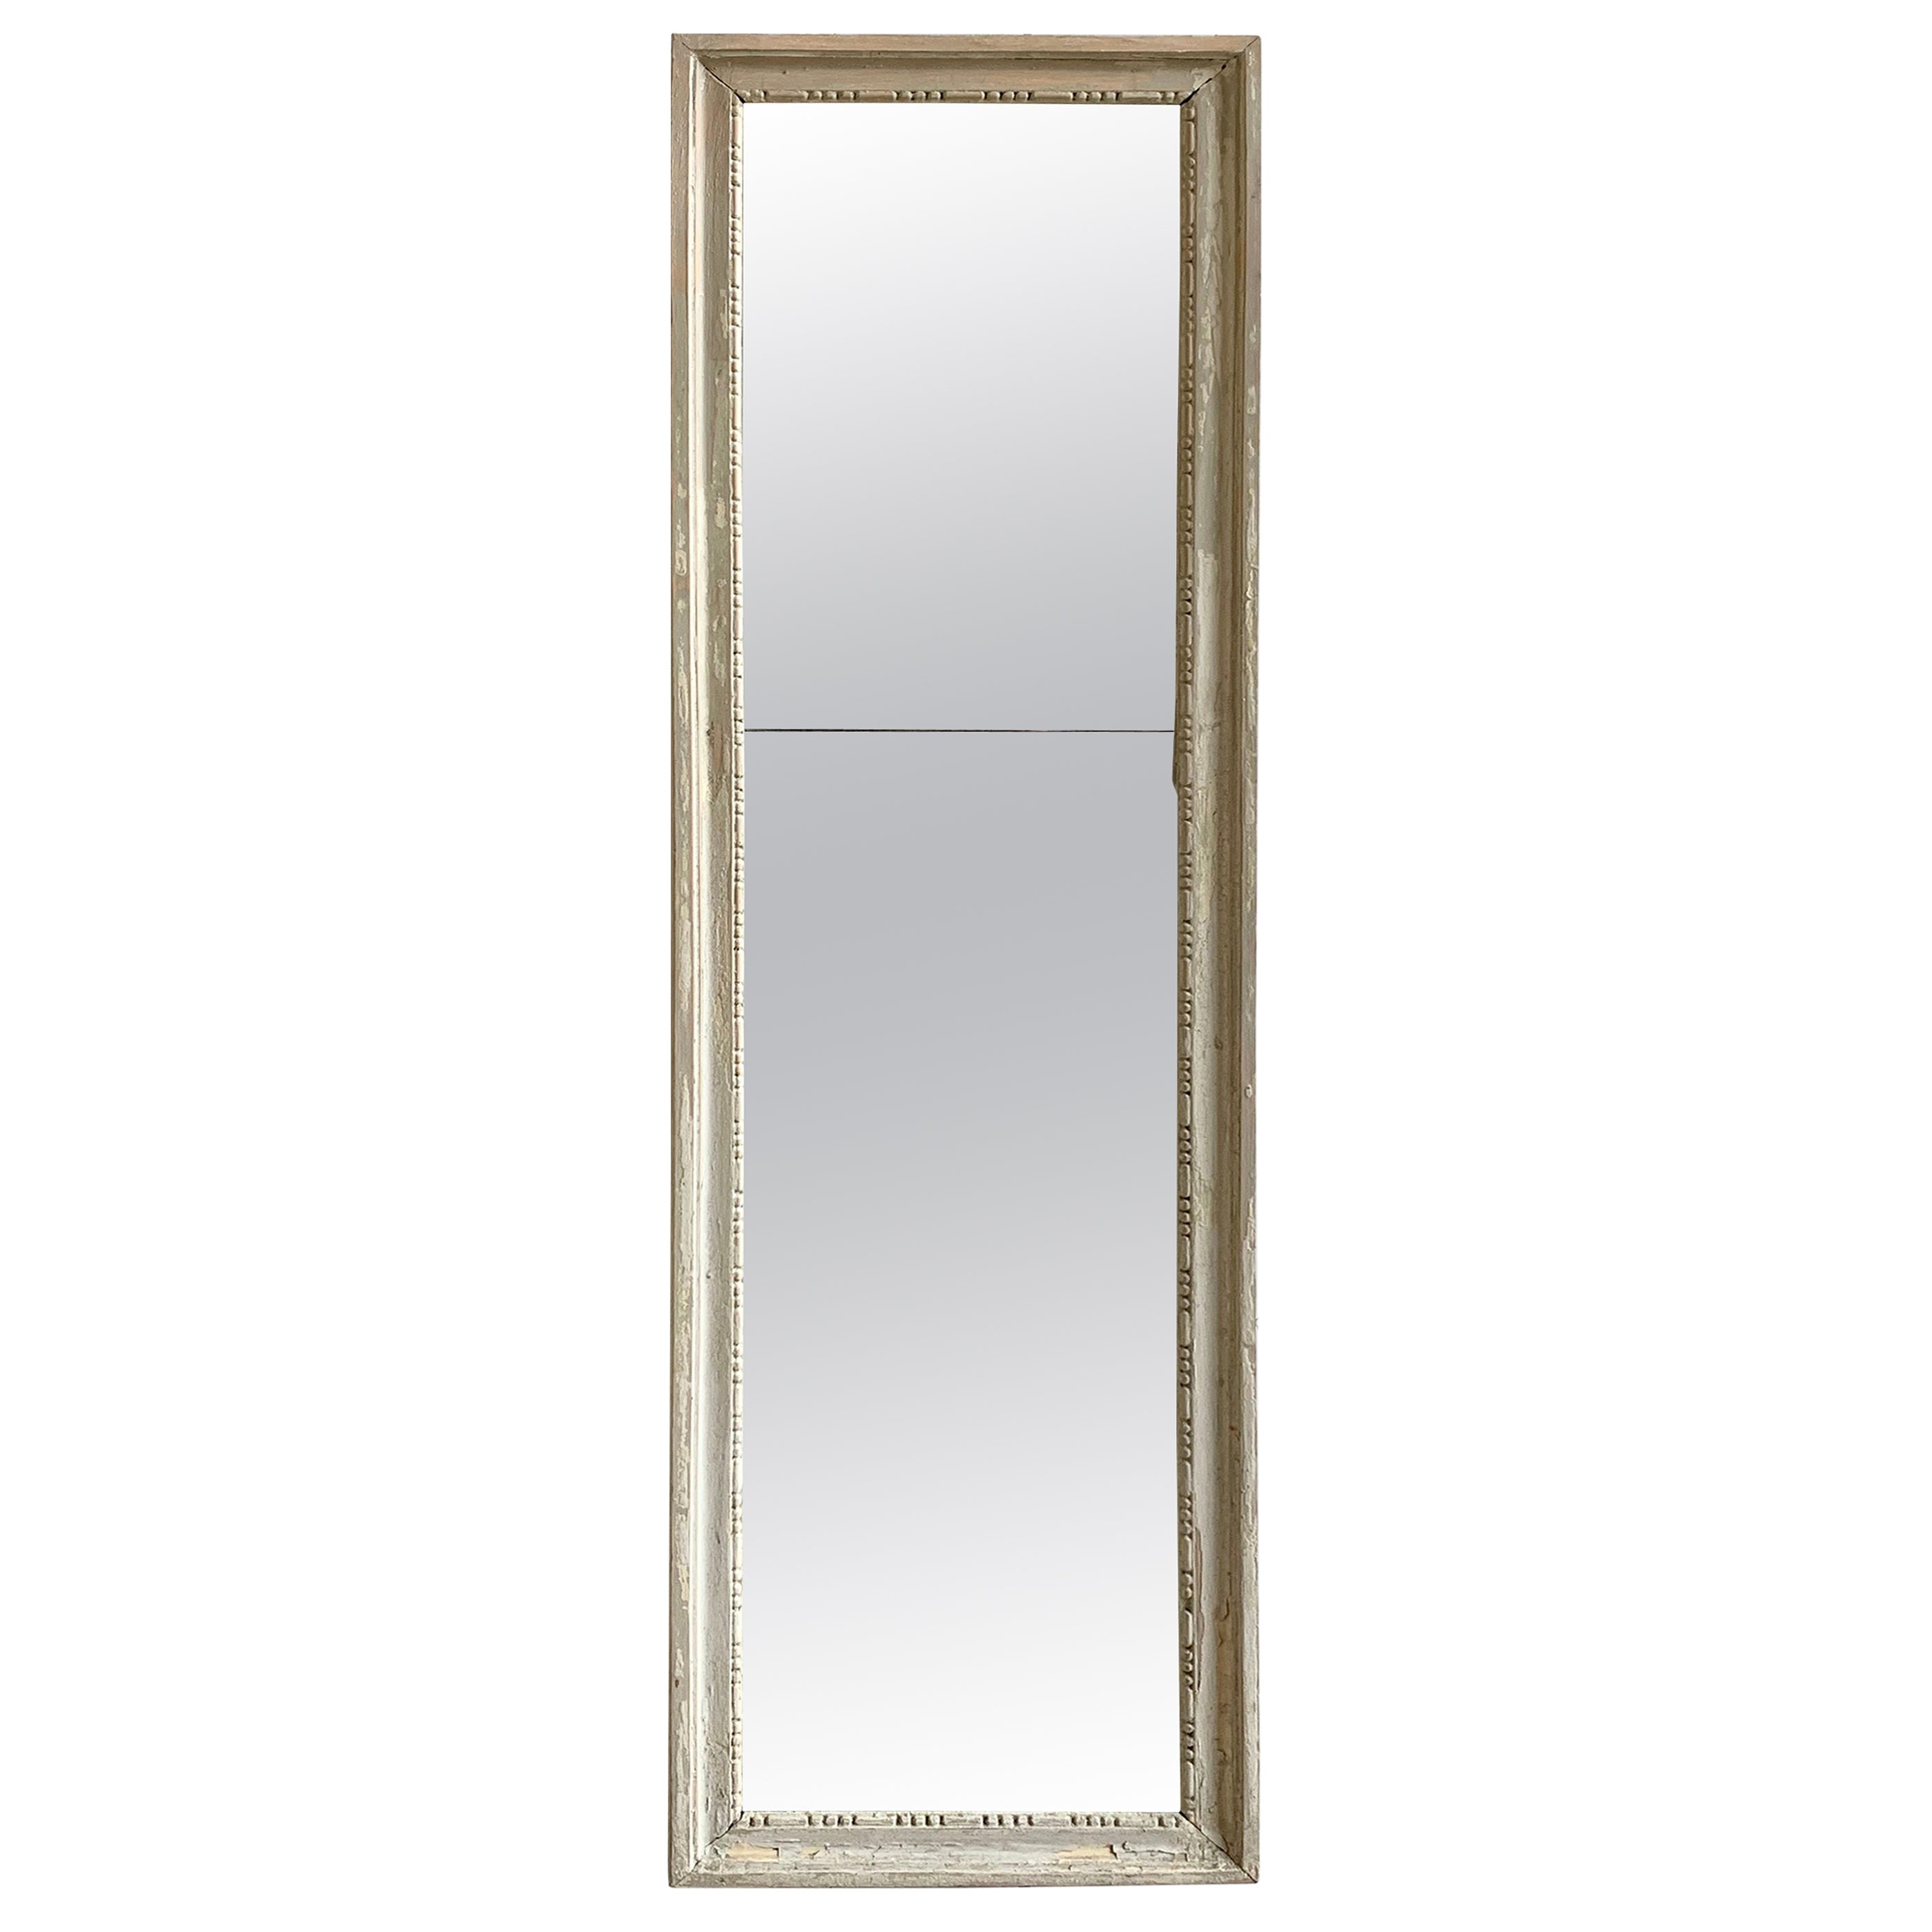 Louis XVI Painted Mirror, 18th Century